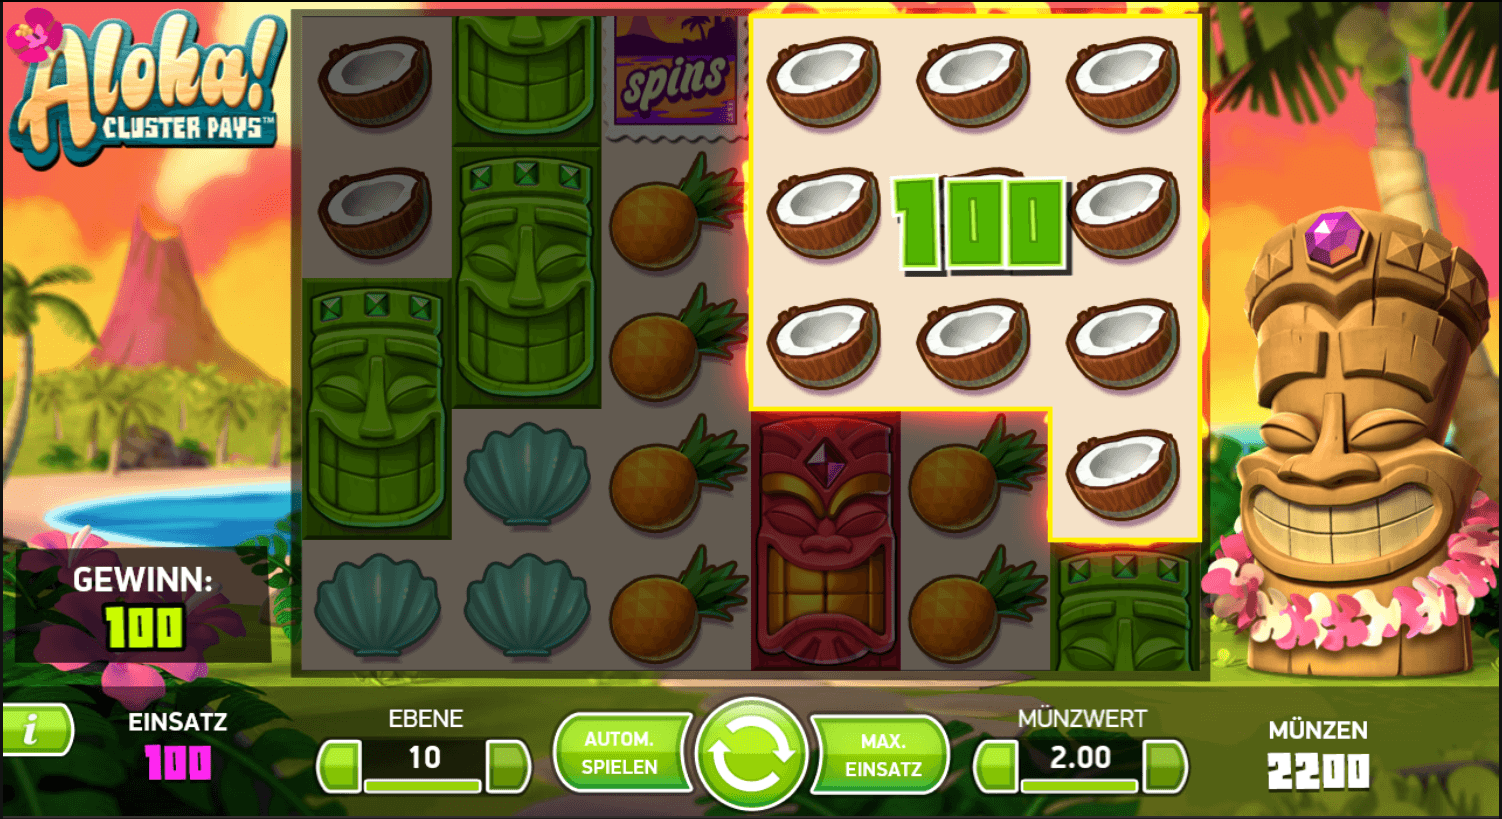 aloha! cluster pays spielen